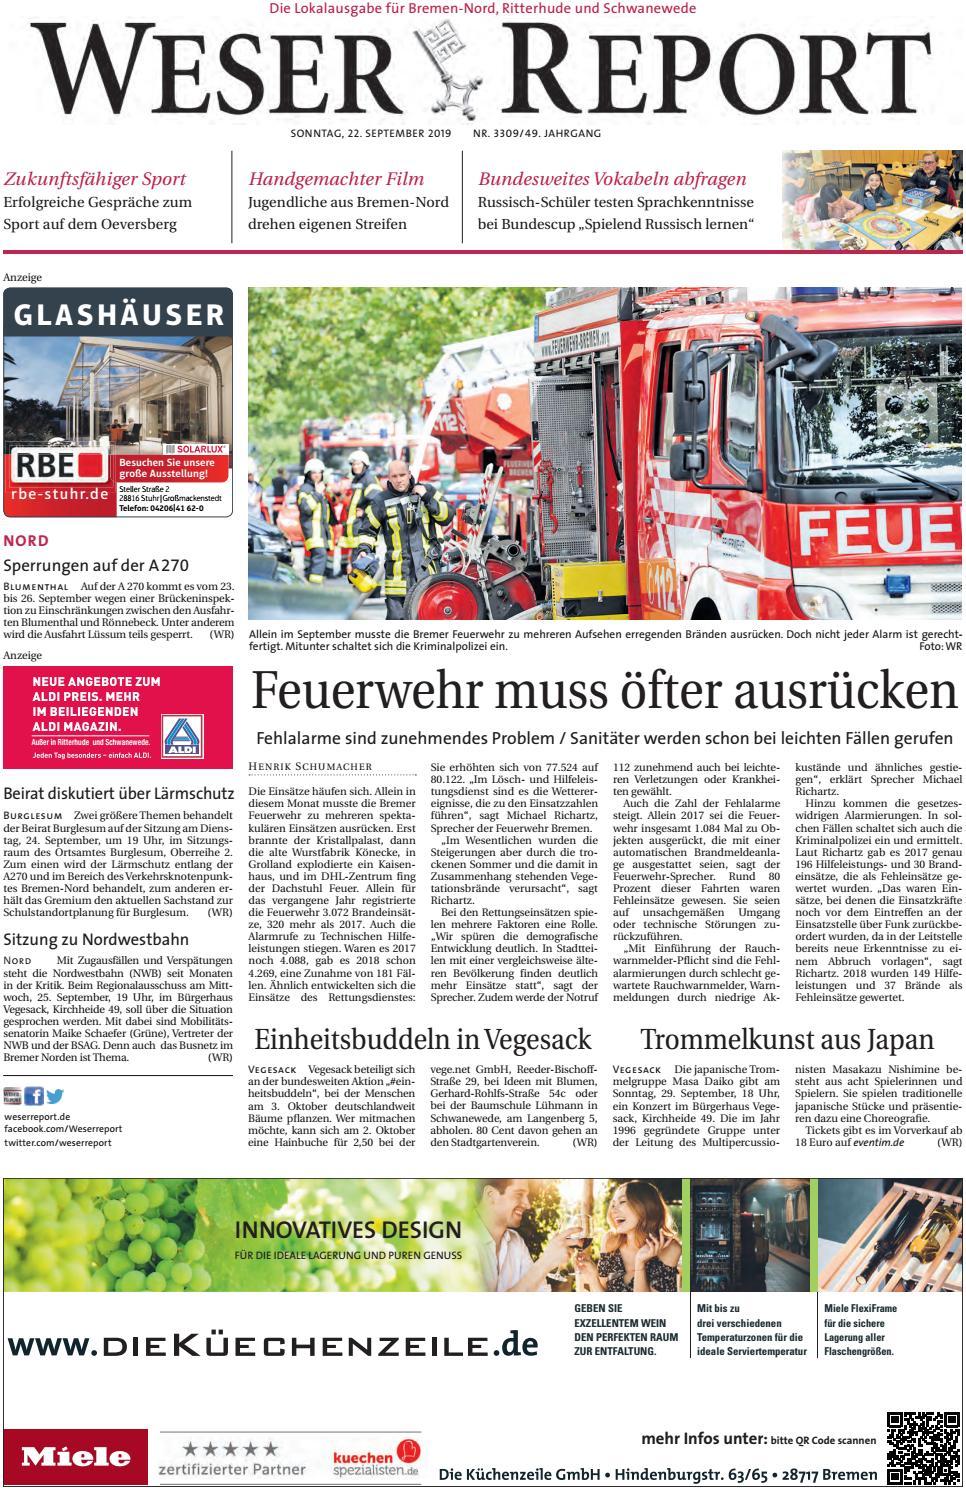 Weser Report Nord Vom 22 09 2019 By Kps Verlagsgesellschaft Mbh